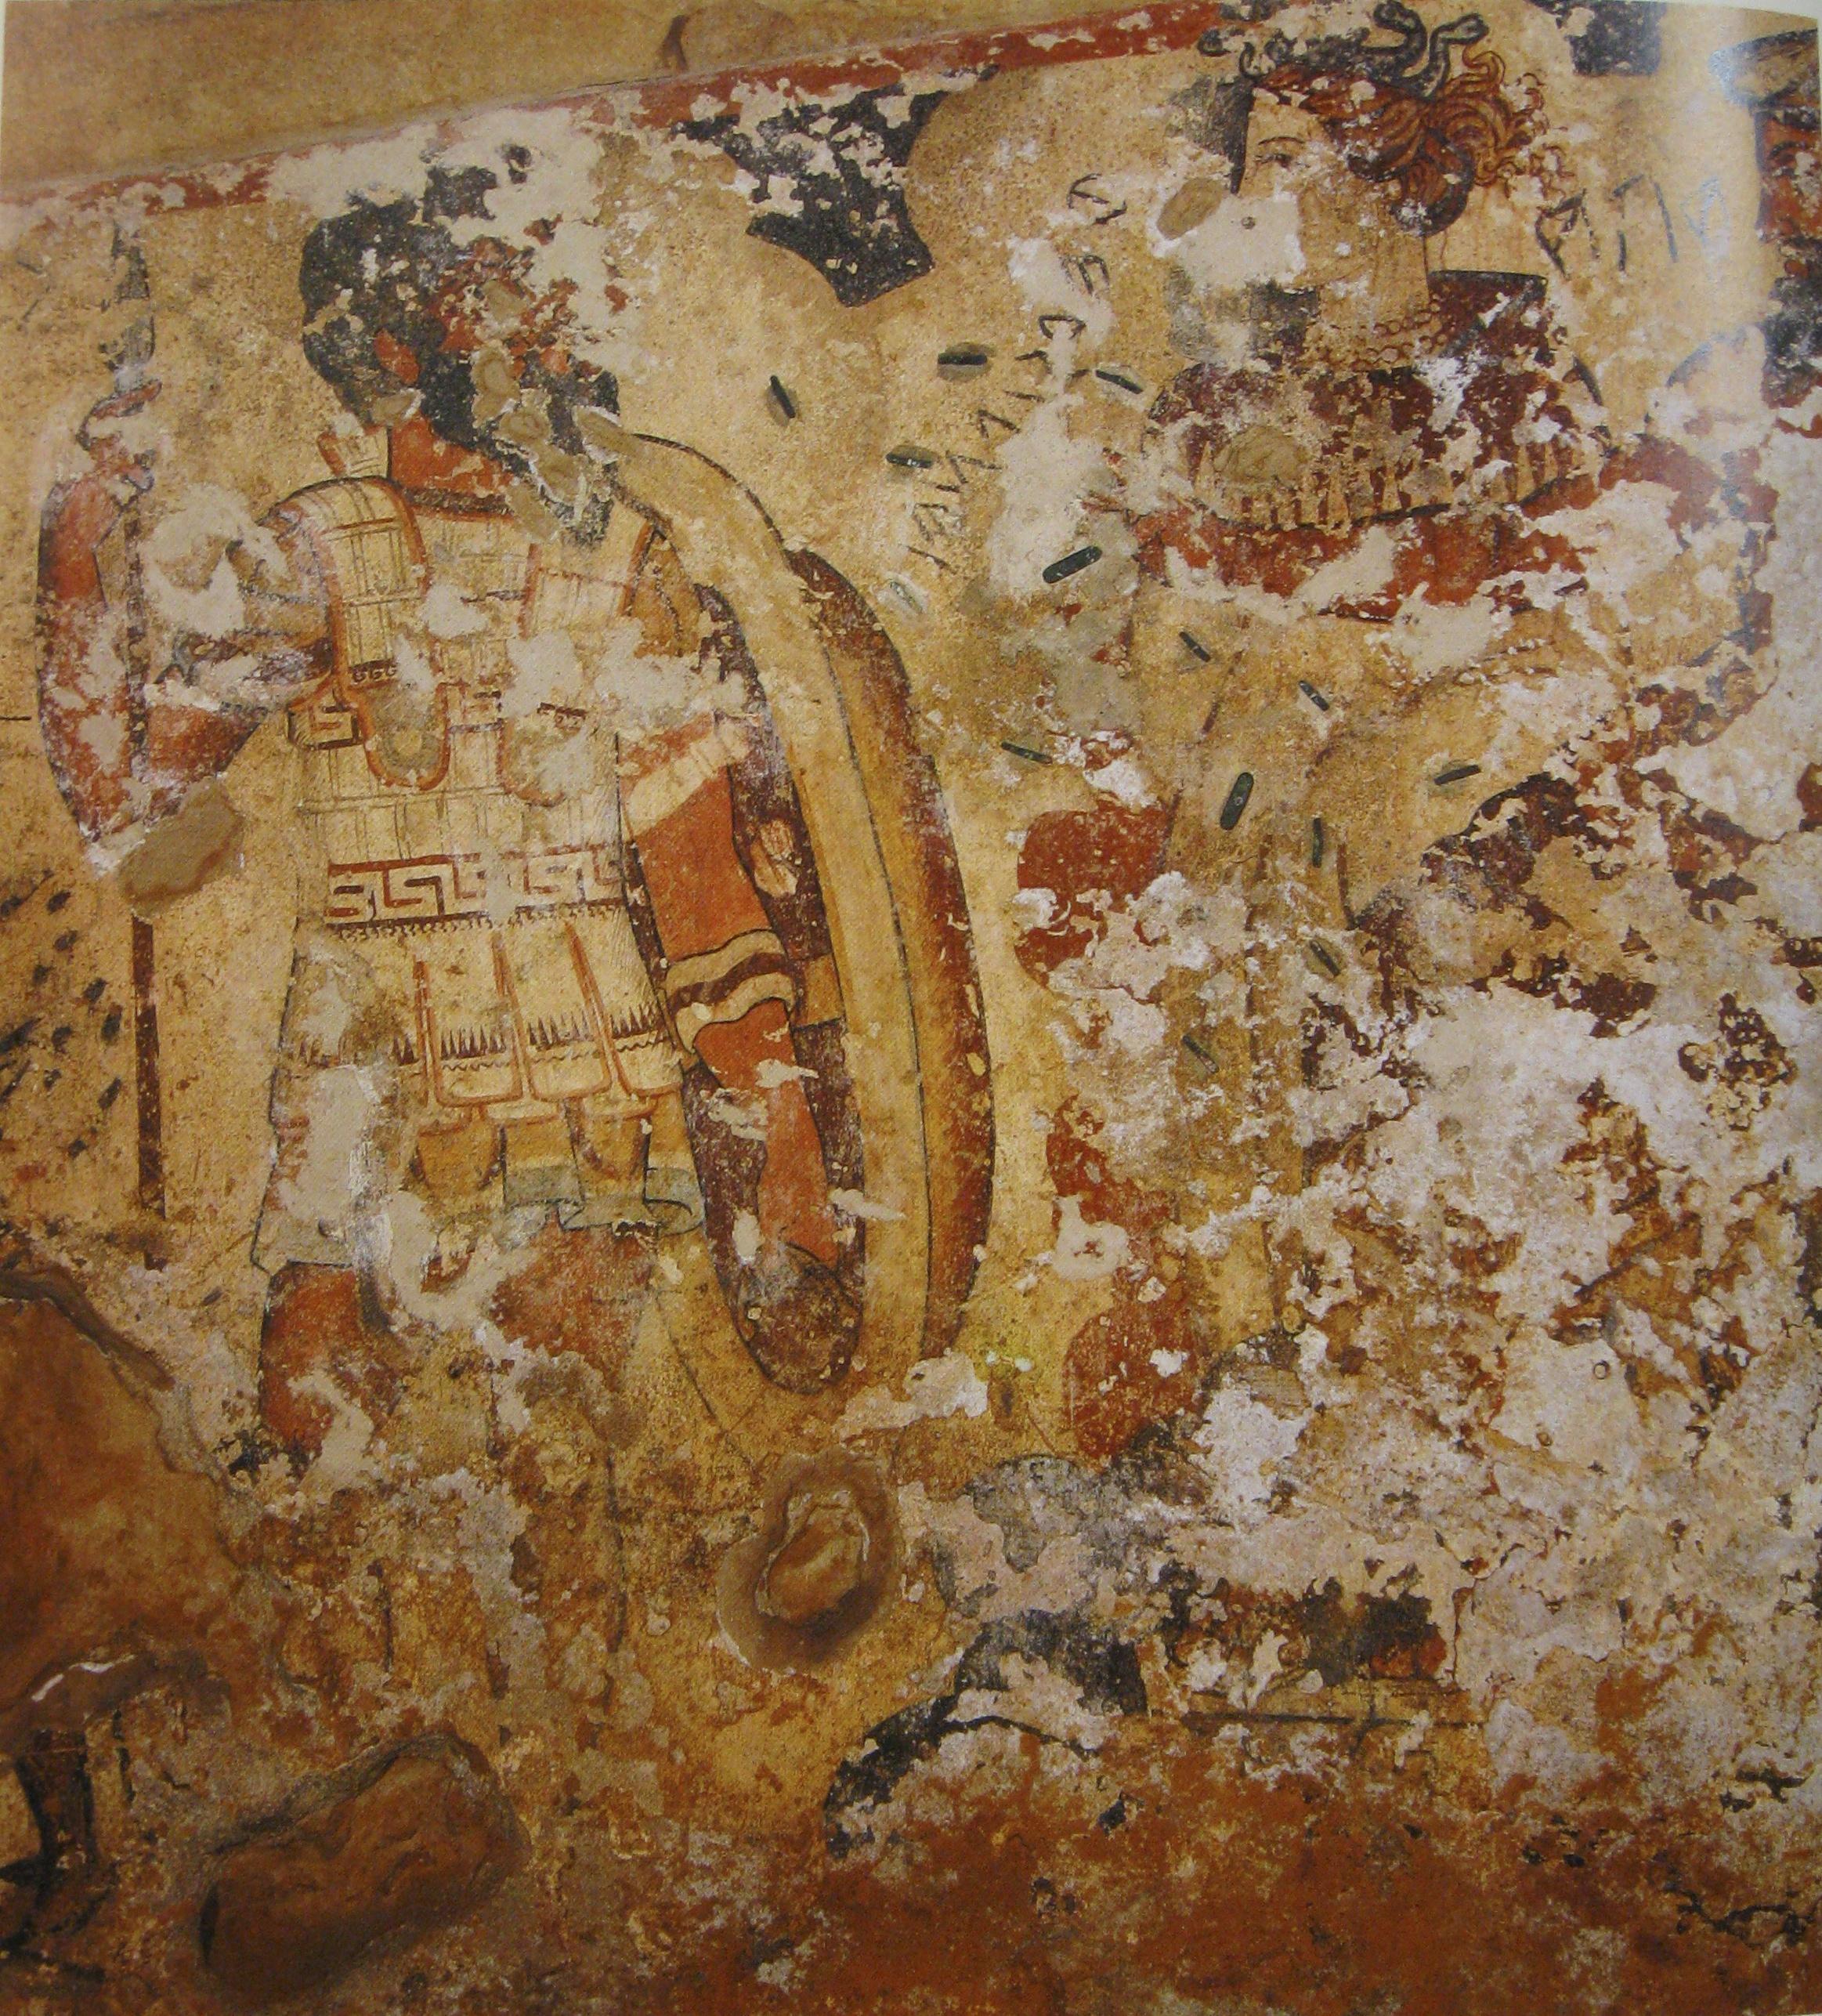 [Image: etrusques_a_069.jpg]